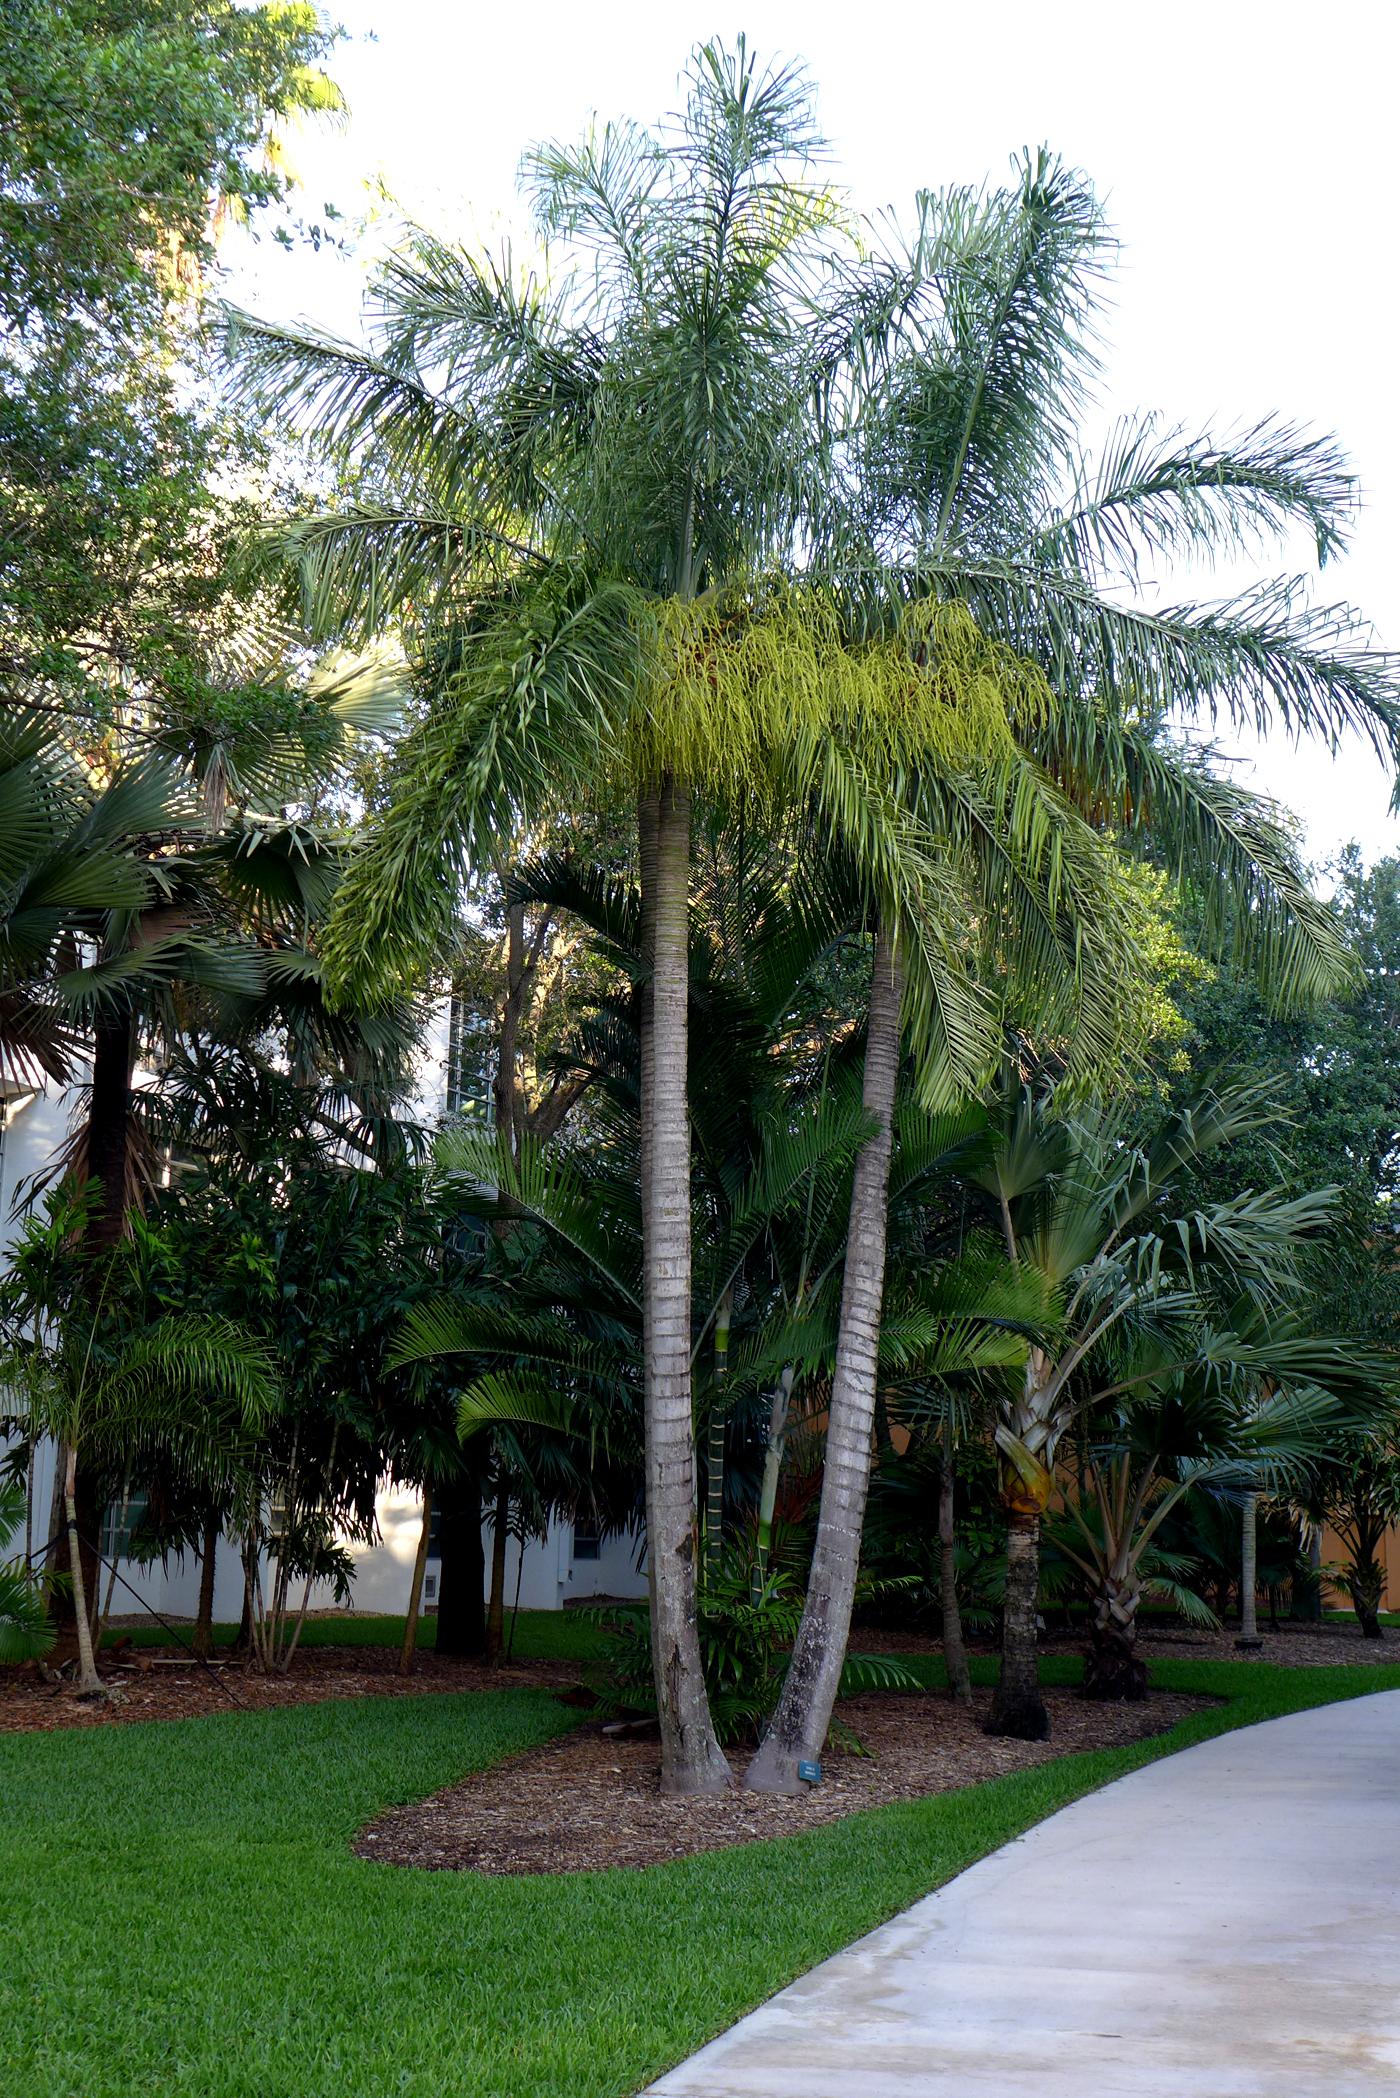 UM Palmetum Dypsis madagascariensis